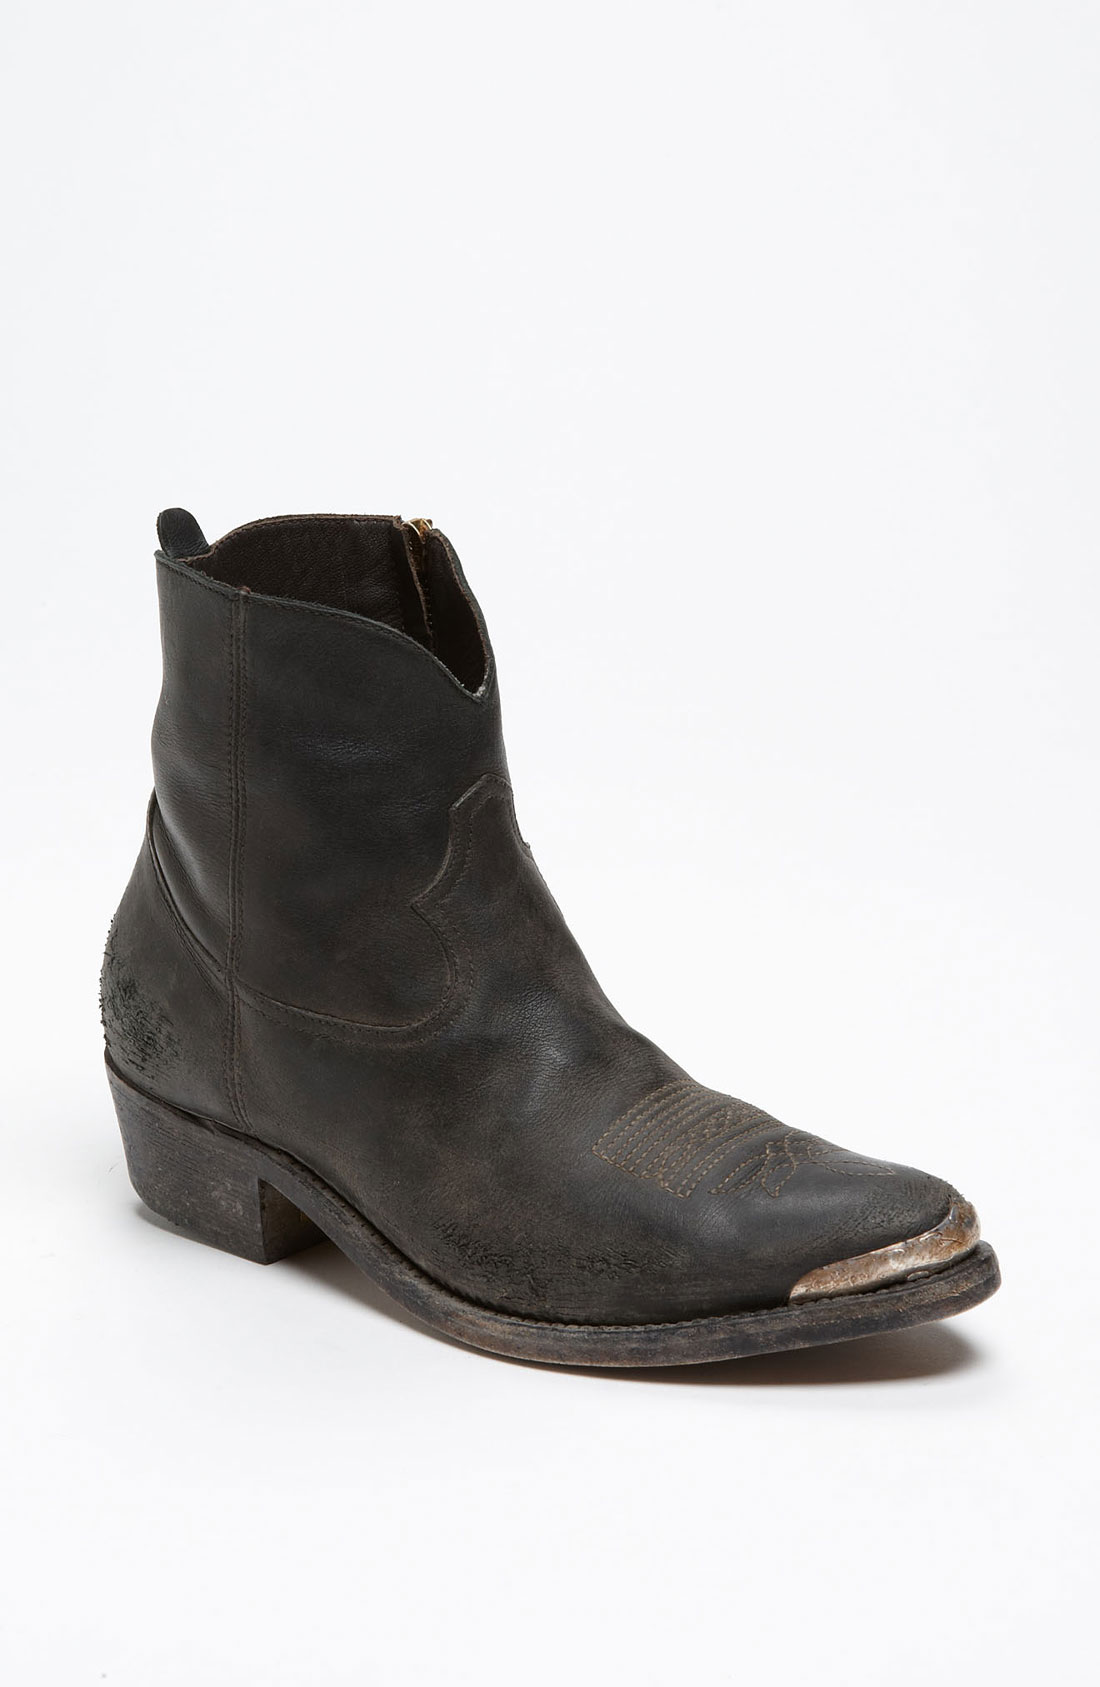 golden goose deluxe brand short biker boot in black stud in black lyst. Black Bedroom Furniture Sets. Home Design Ideas